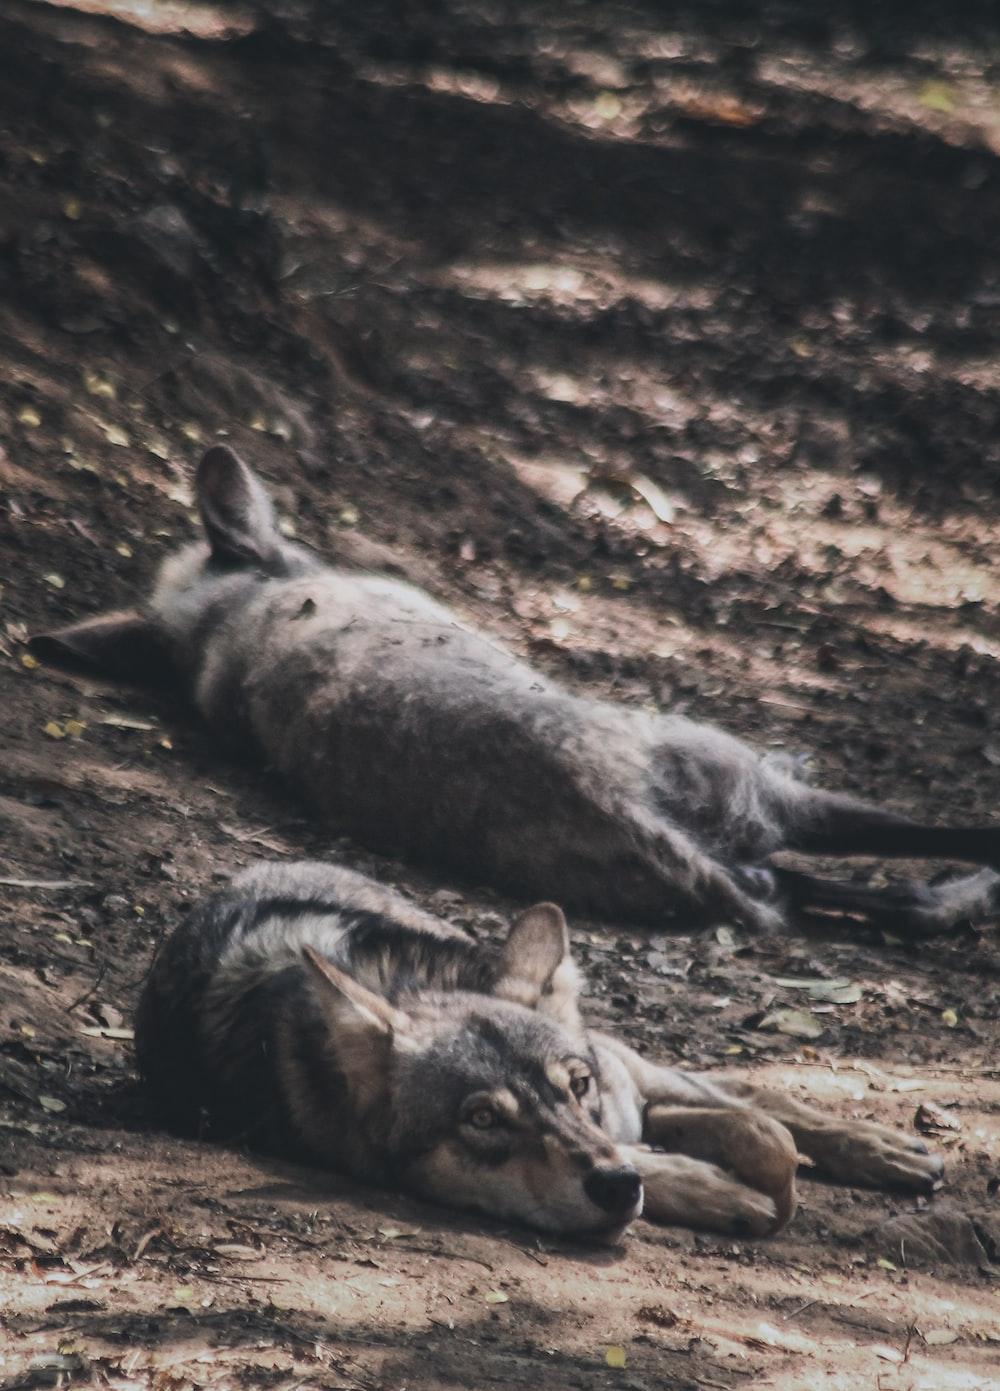 three black and brown animals on ground during daytime